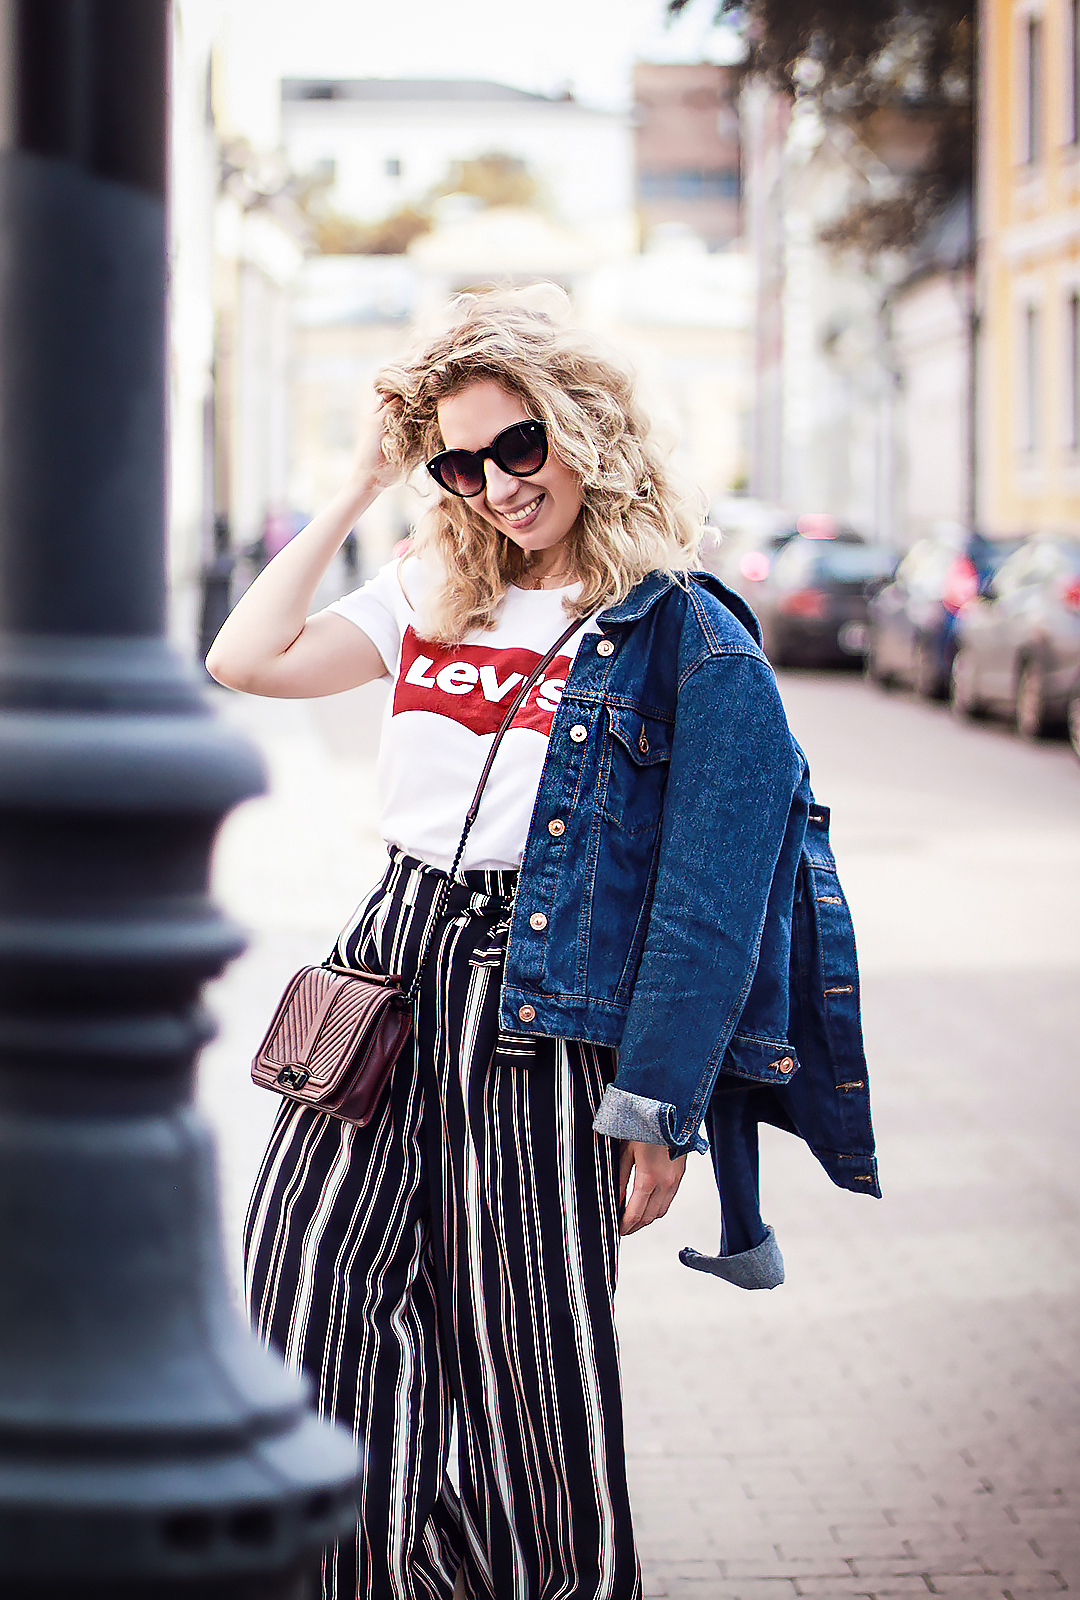 Rita_maslova_Levis_shirt_denim_jacket_zara_stryped_culottes_marsala_heels_russian_fashion_blogger_streetstyle